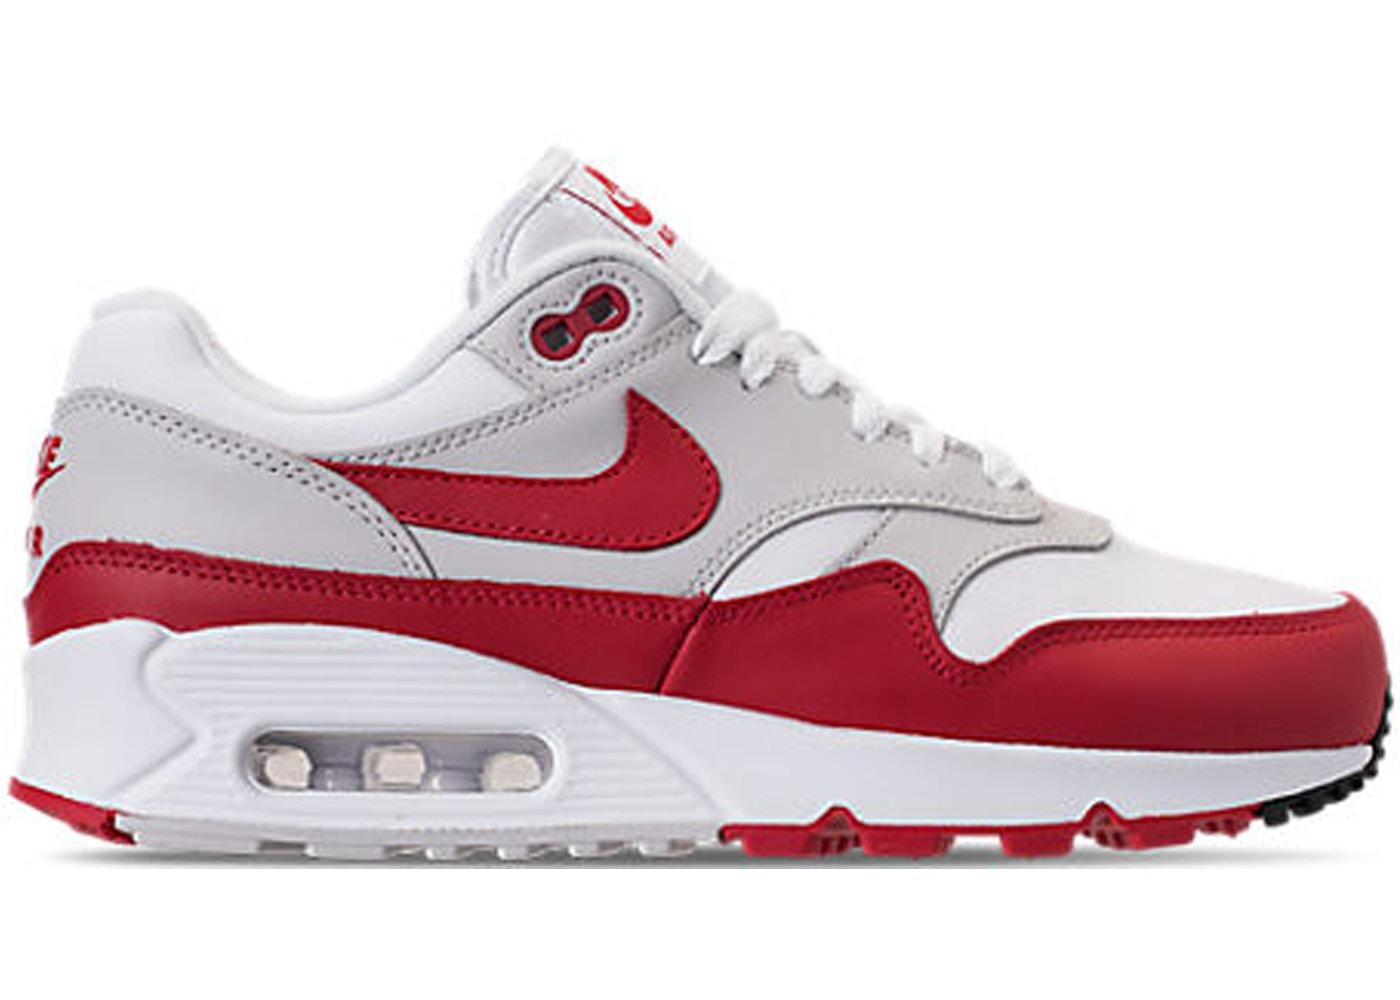 3d0e180c Air Max 90/1 White University Red (W) - AQ1273-100